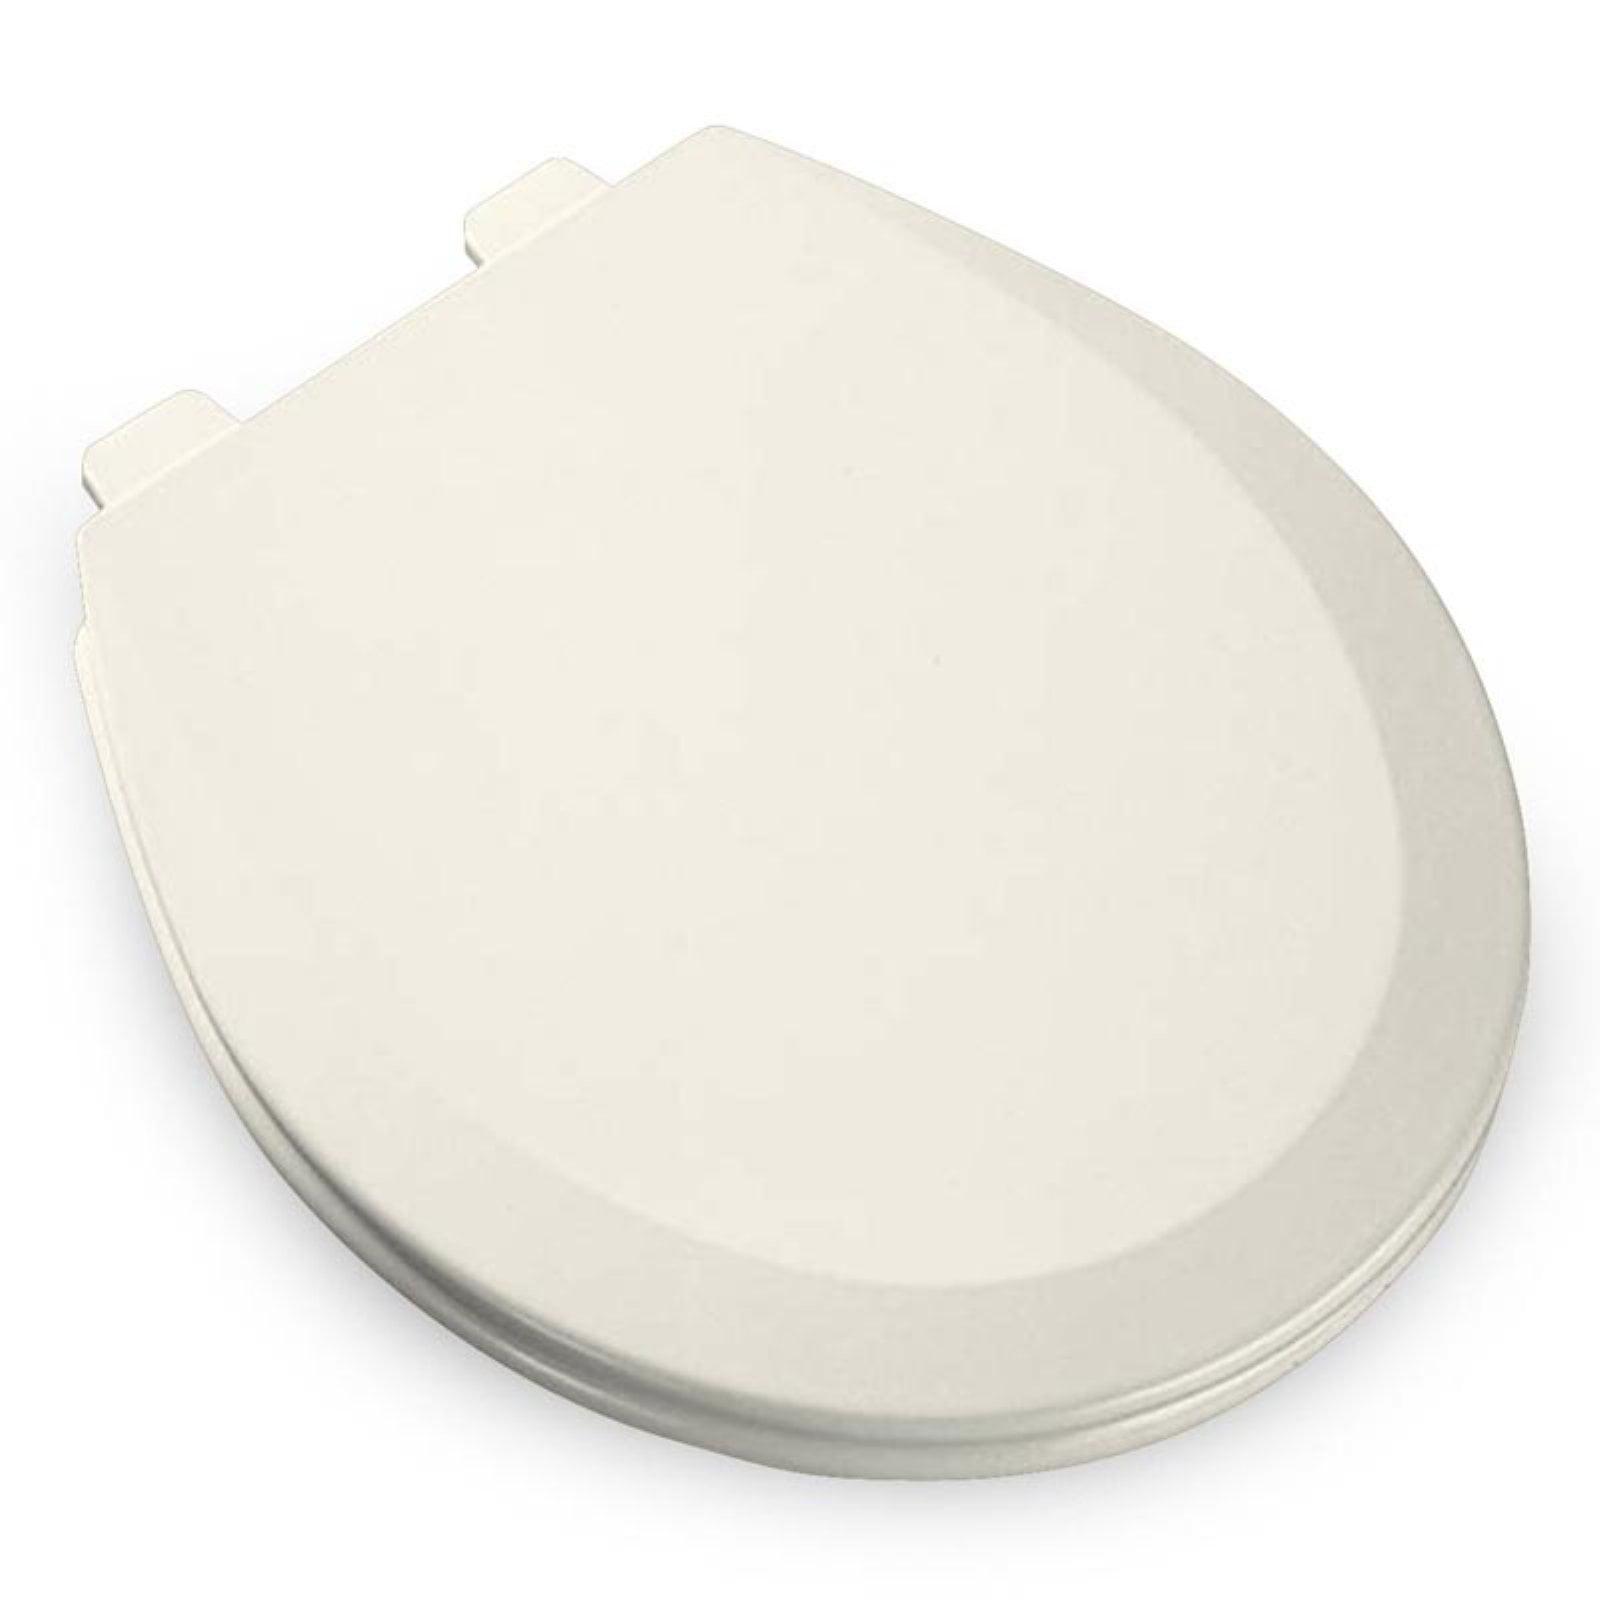 bemis white toilet seat. Bemis 500EC Lift Off Wood Round Toilet Seat  Available In Various Colors BEMIS Closed Front 18 7 8 In 1500EC 000 Walmart Com